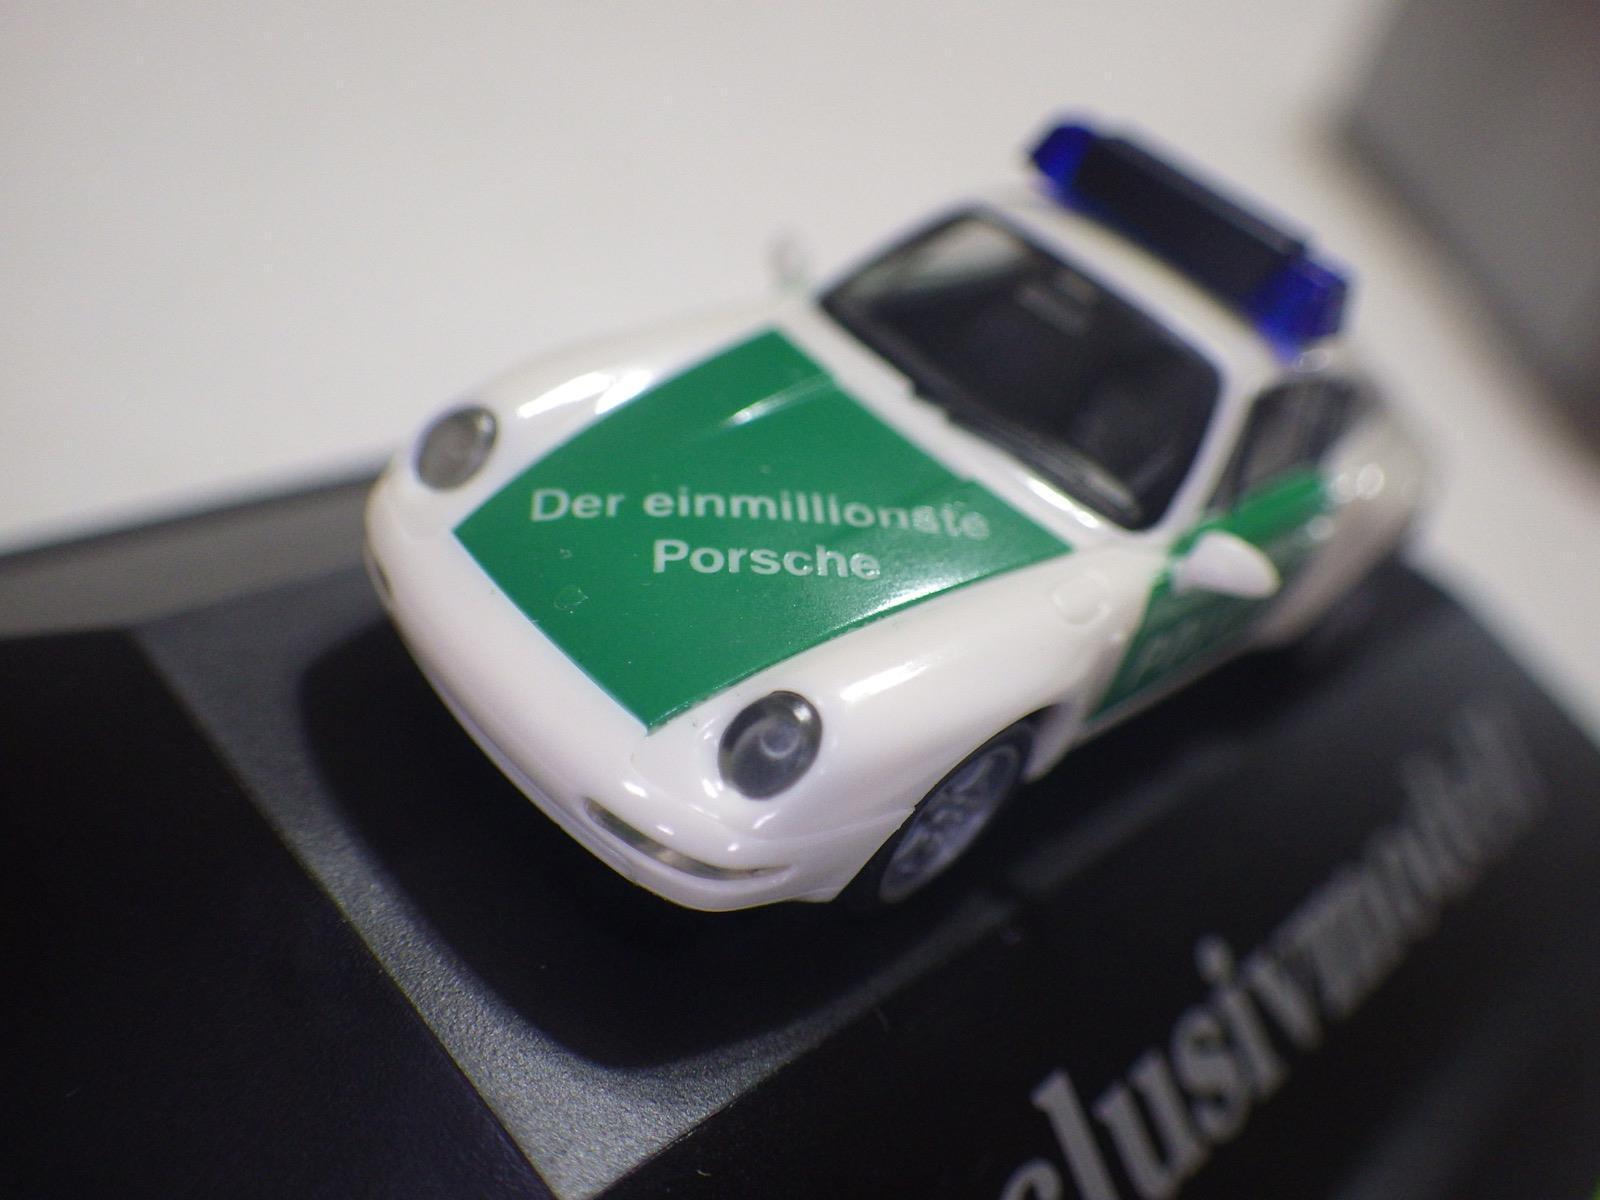 Herpa Exclusiv Serie (Alemania) biancao verde Porsche 911 carrera CPE Polizei 1 87